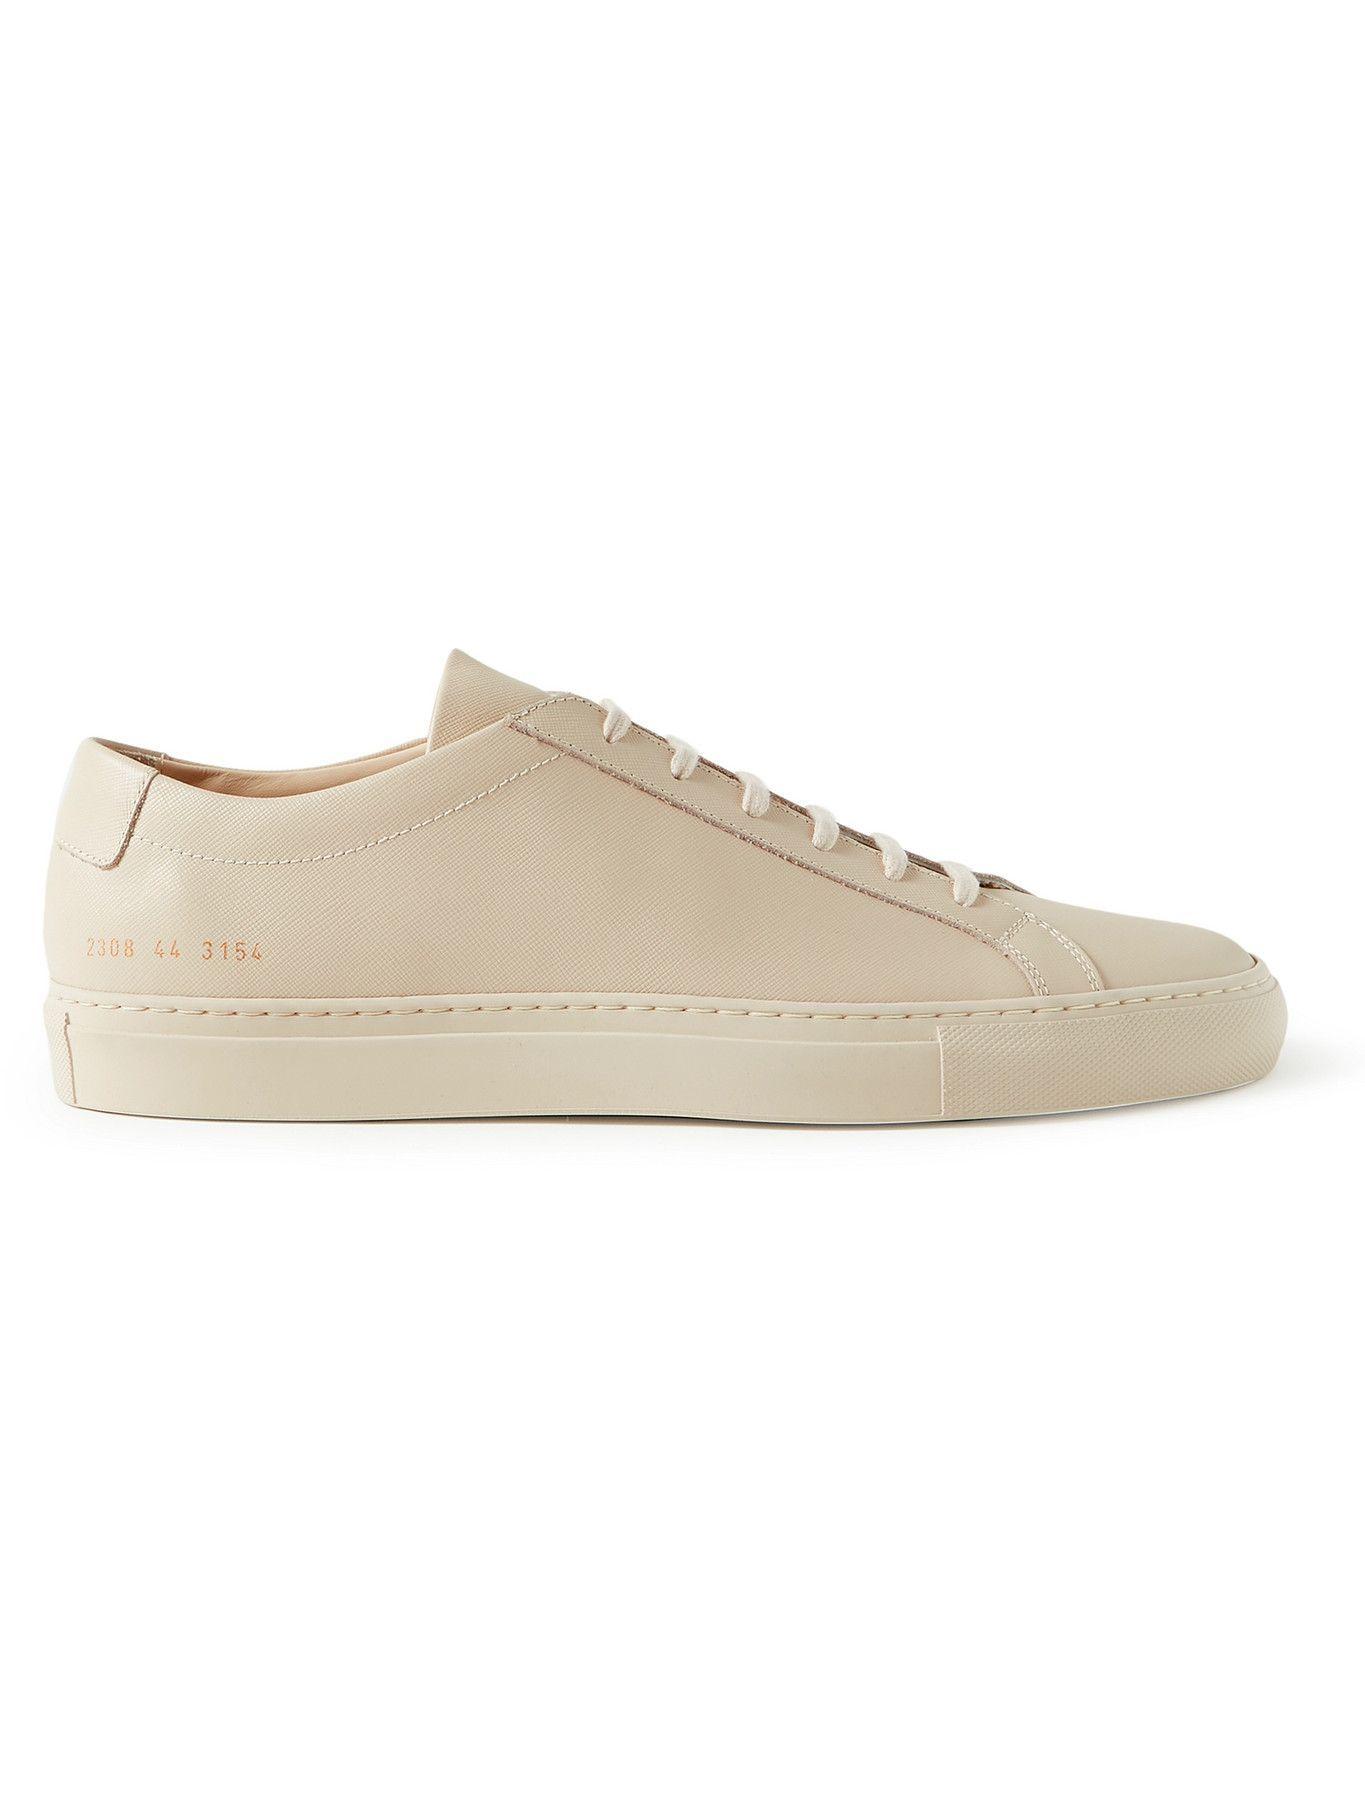 Photo: Common Projects - Original Achilles Saffiano Leather Sneakers - Neutrals